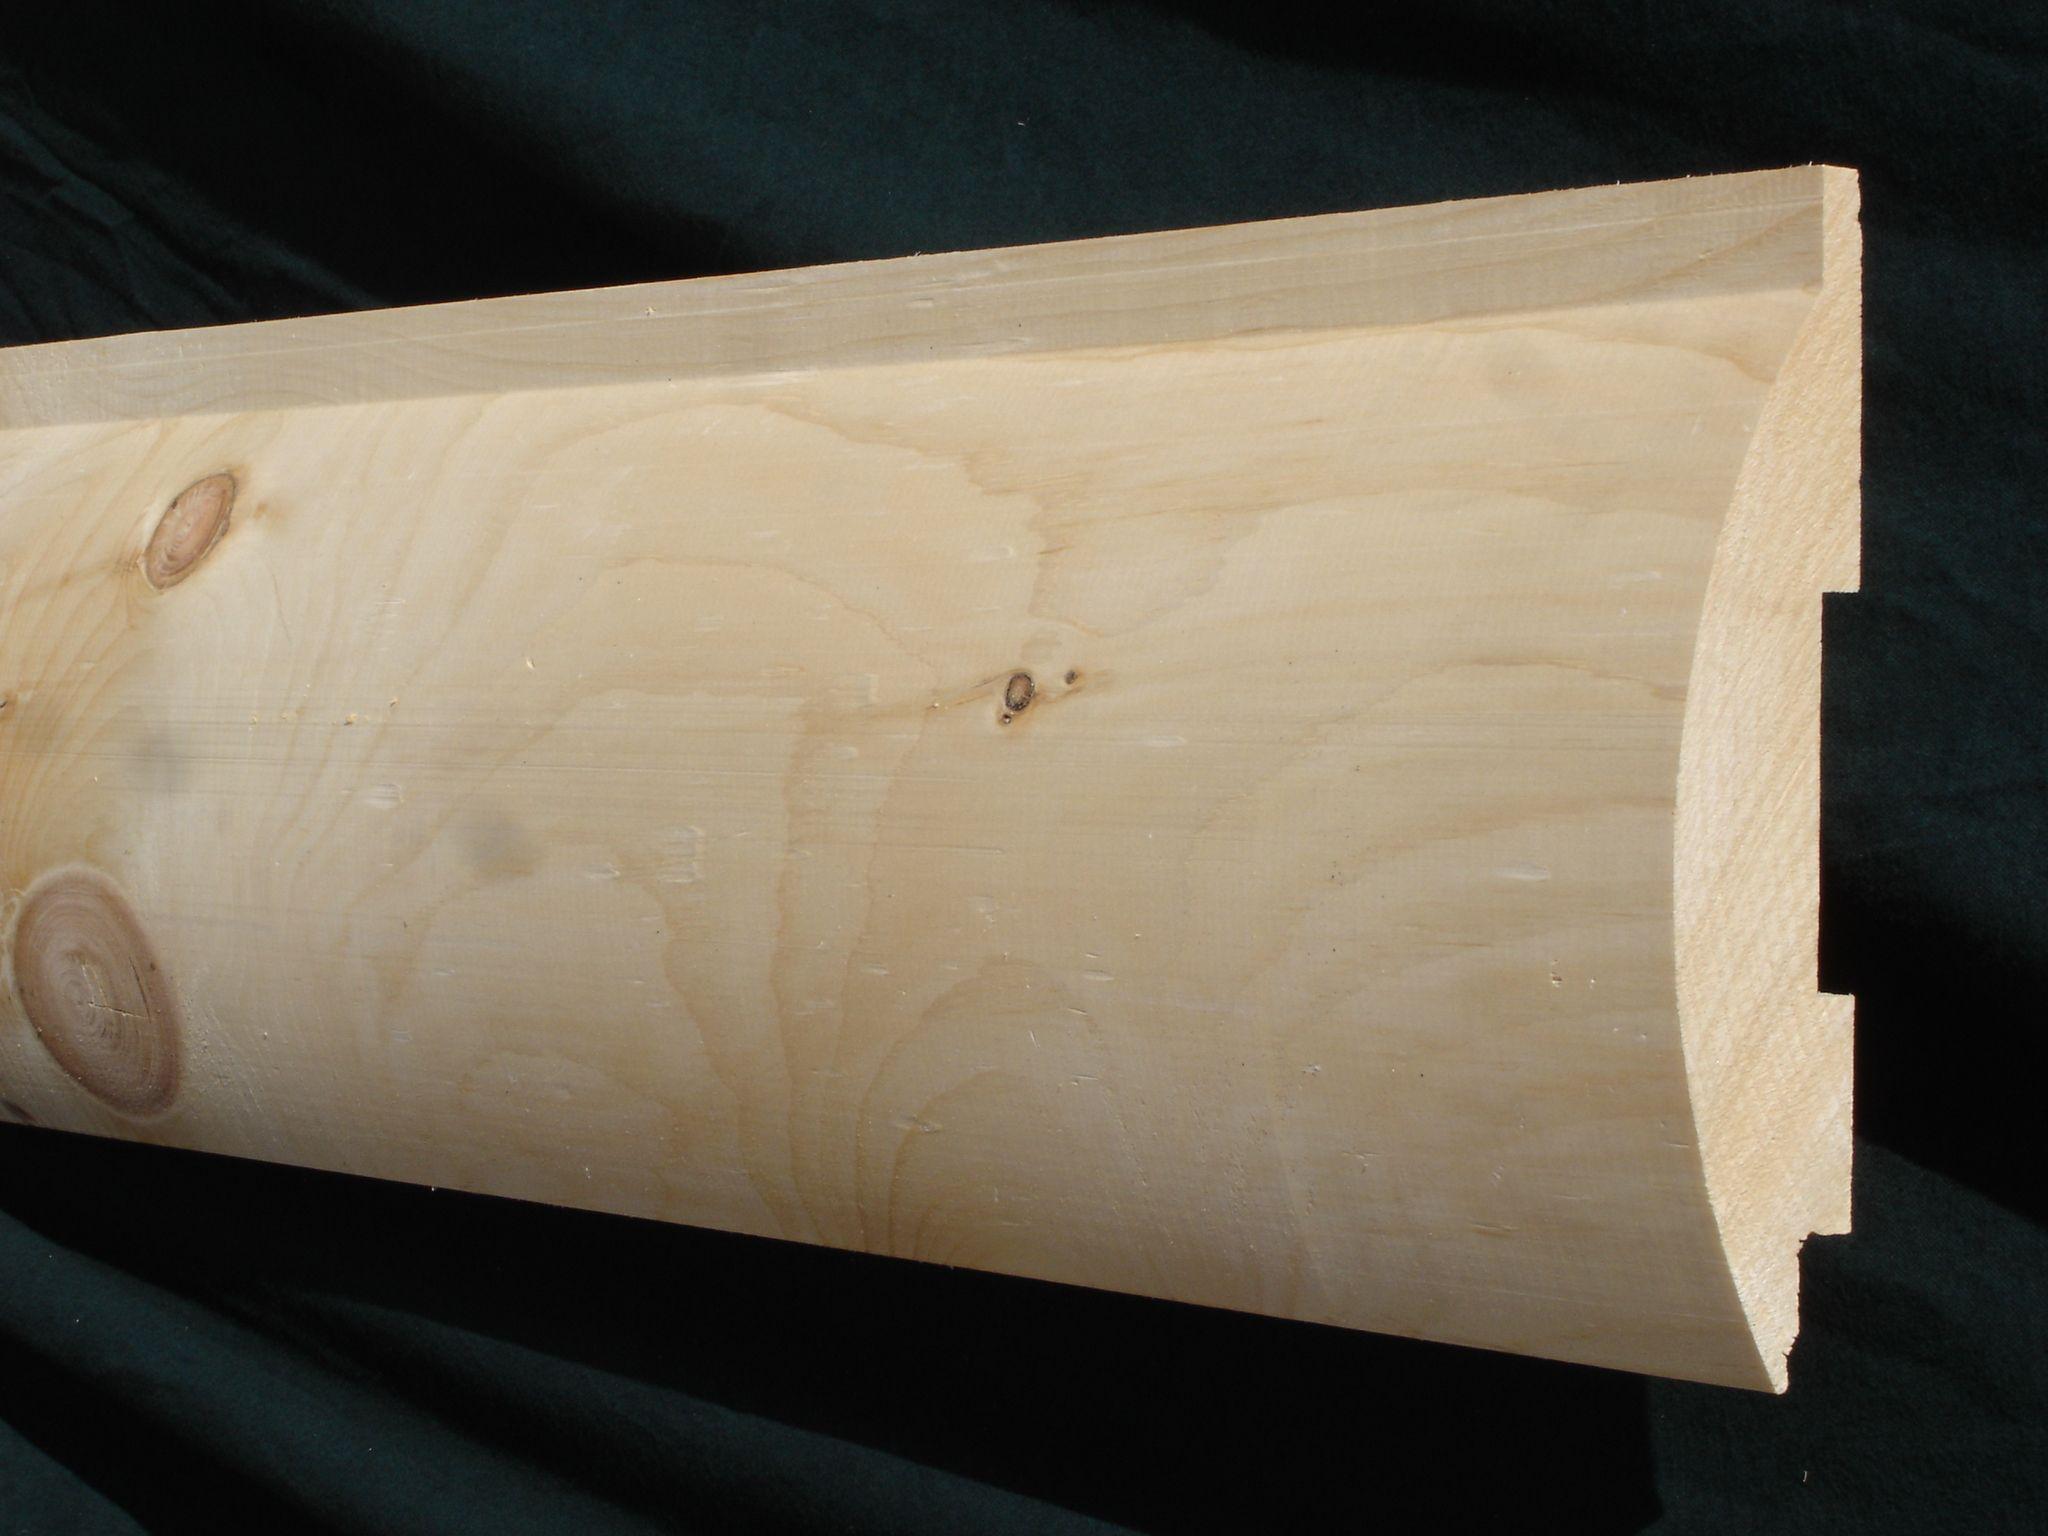 3x8 log siding hand hewn pine - 3x8 Log Siding Hand Hewn Pine 48